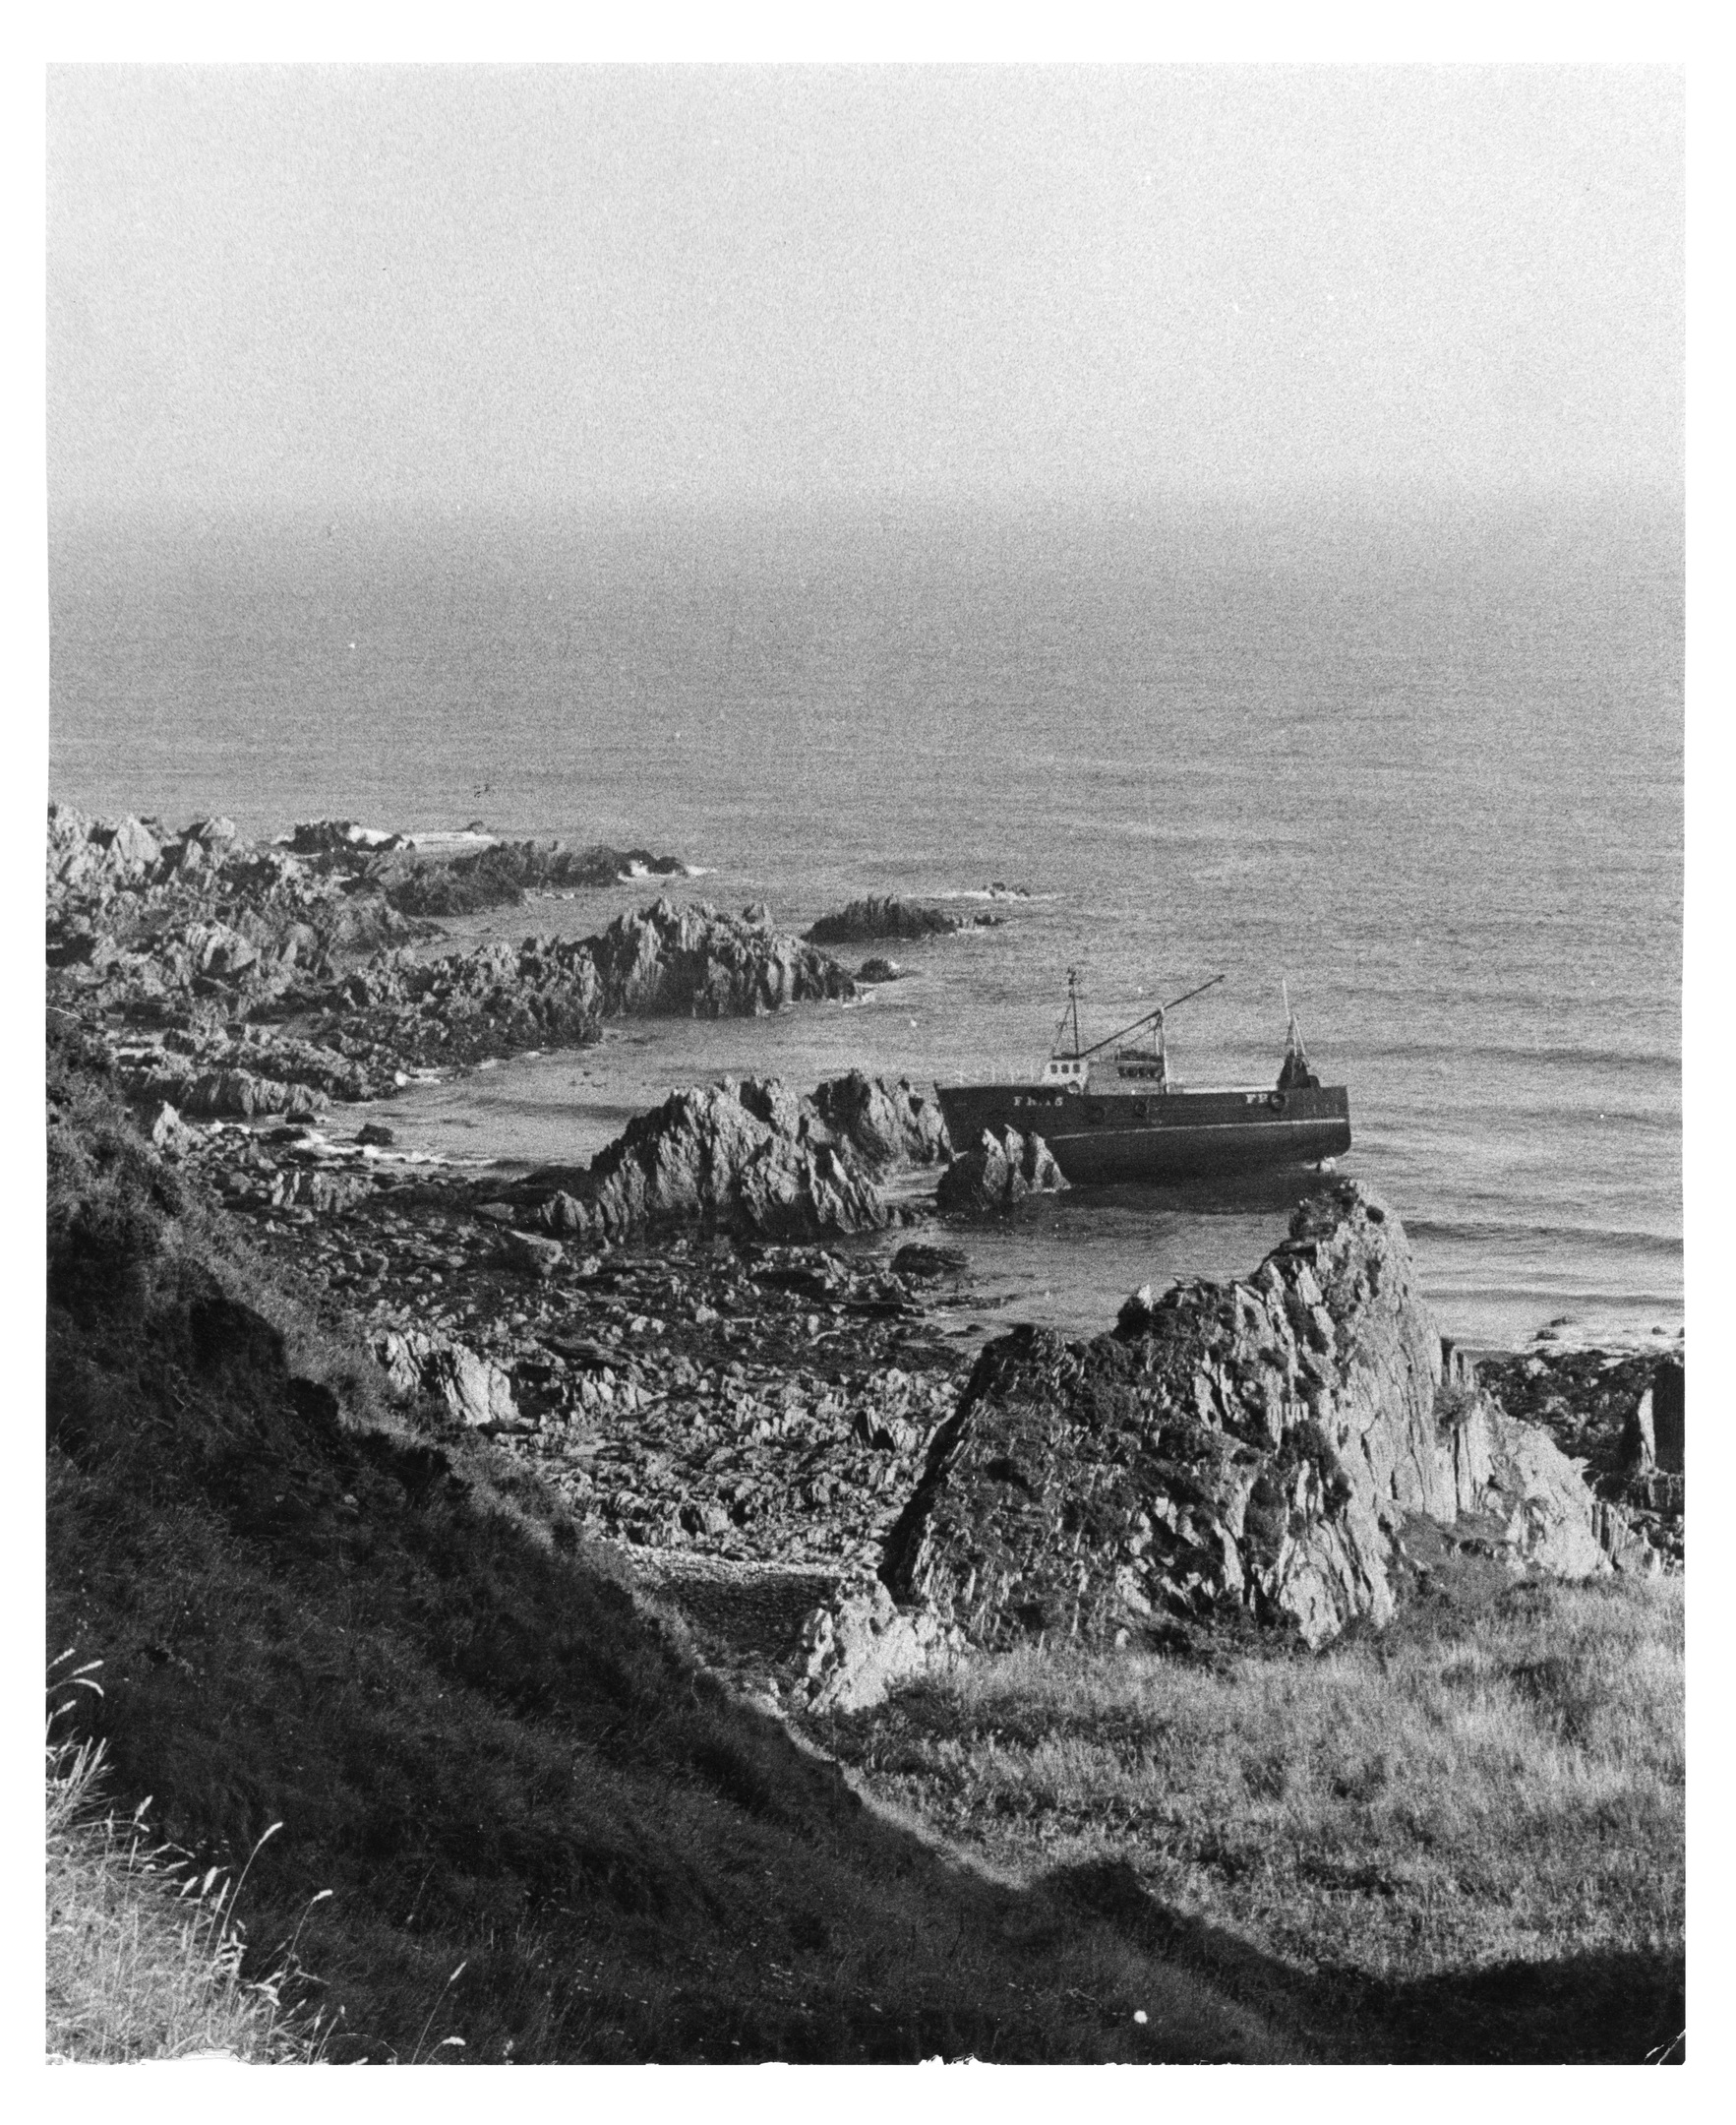 Fraserburgh fishing boat Artemis on rocks between Logie Head and Findlater Castle.